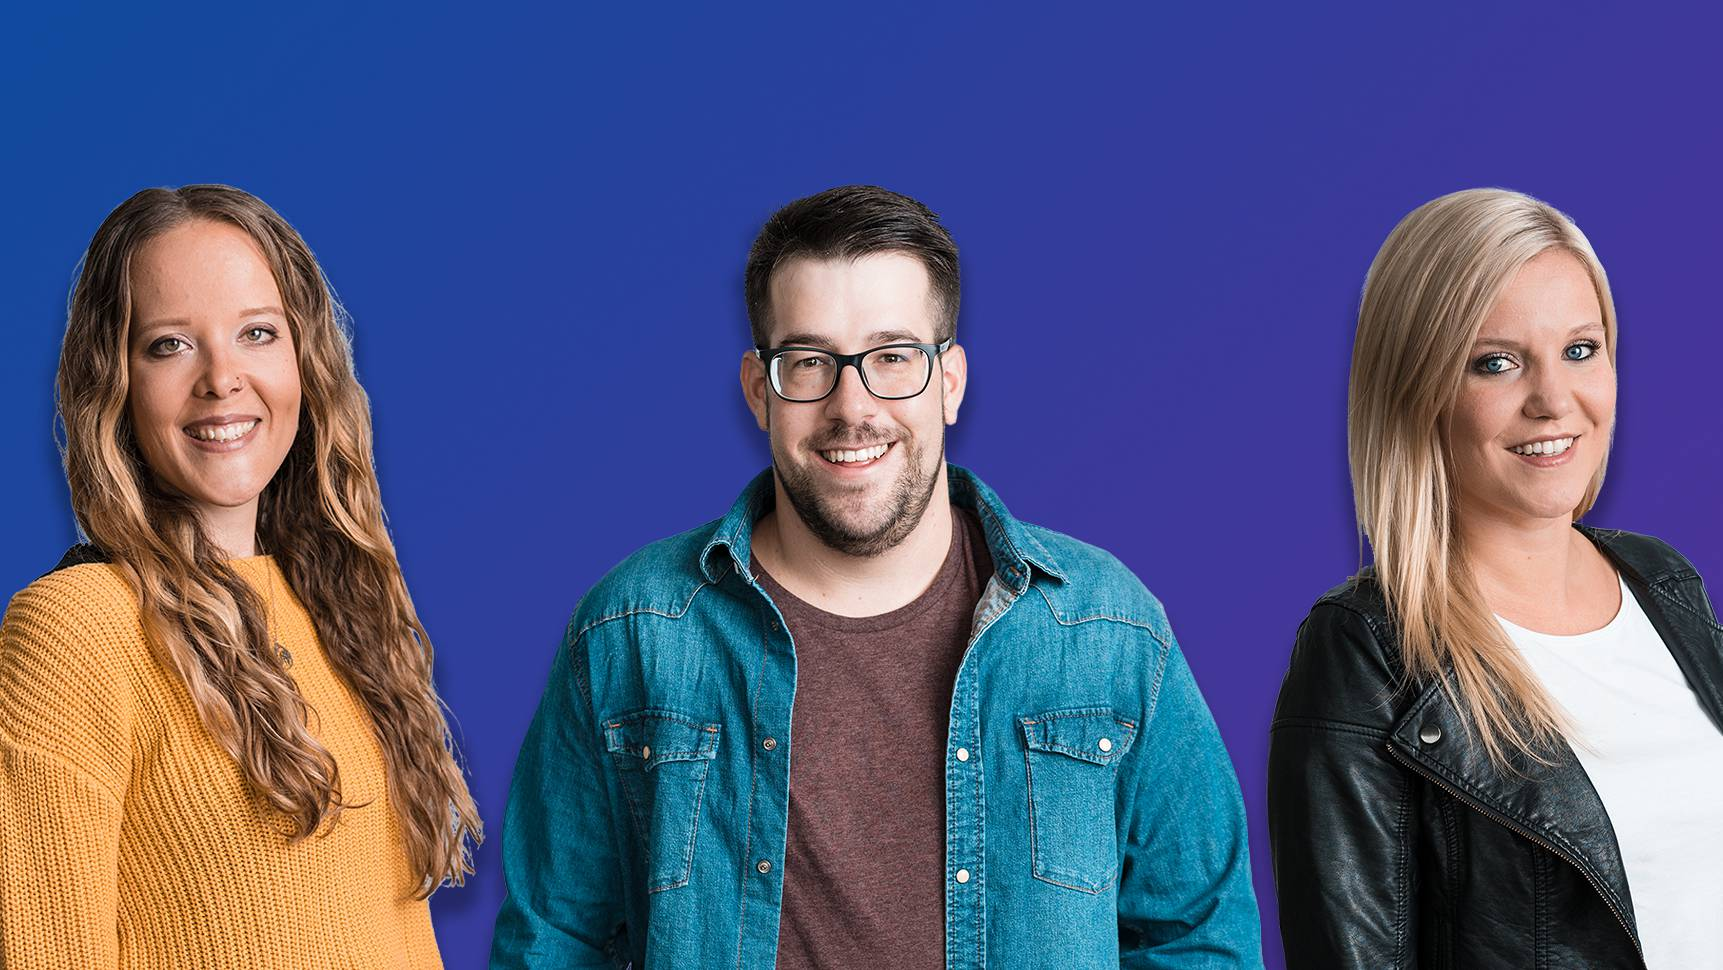 Morgenshow - Manuela Roth, Marco Imbach und Jasmin Langenegger